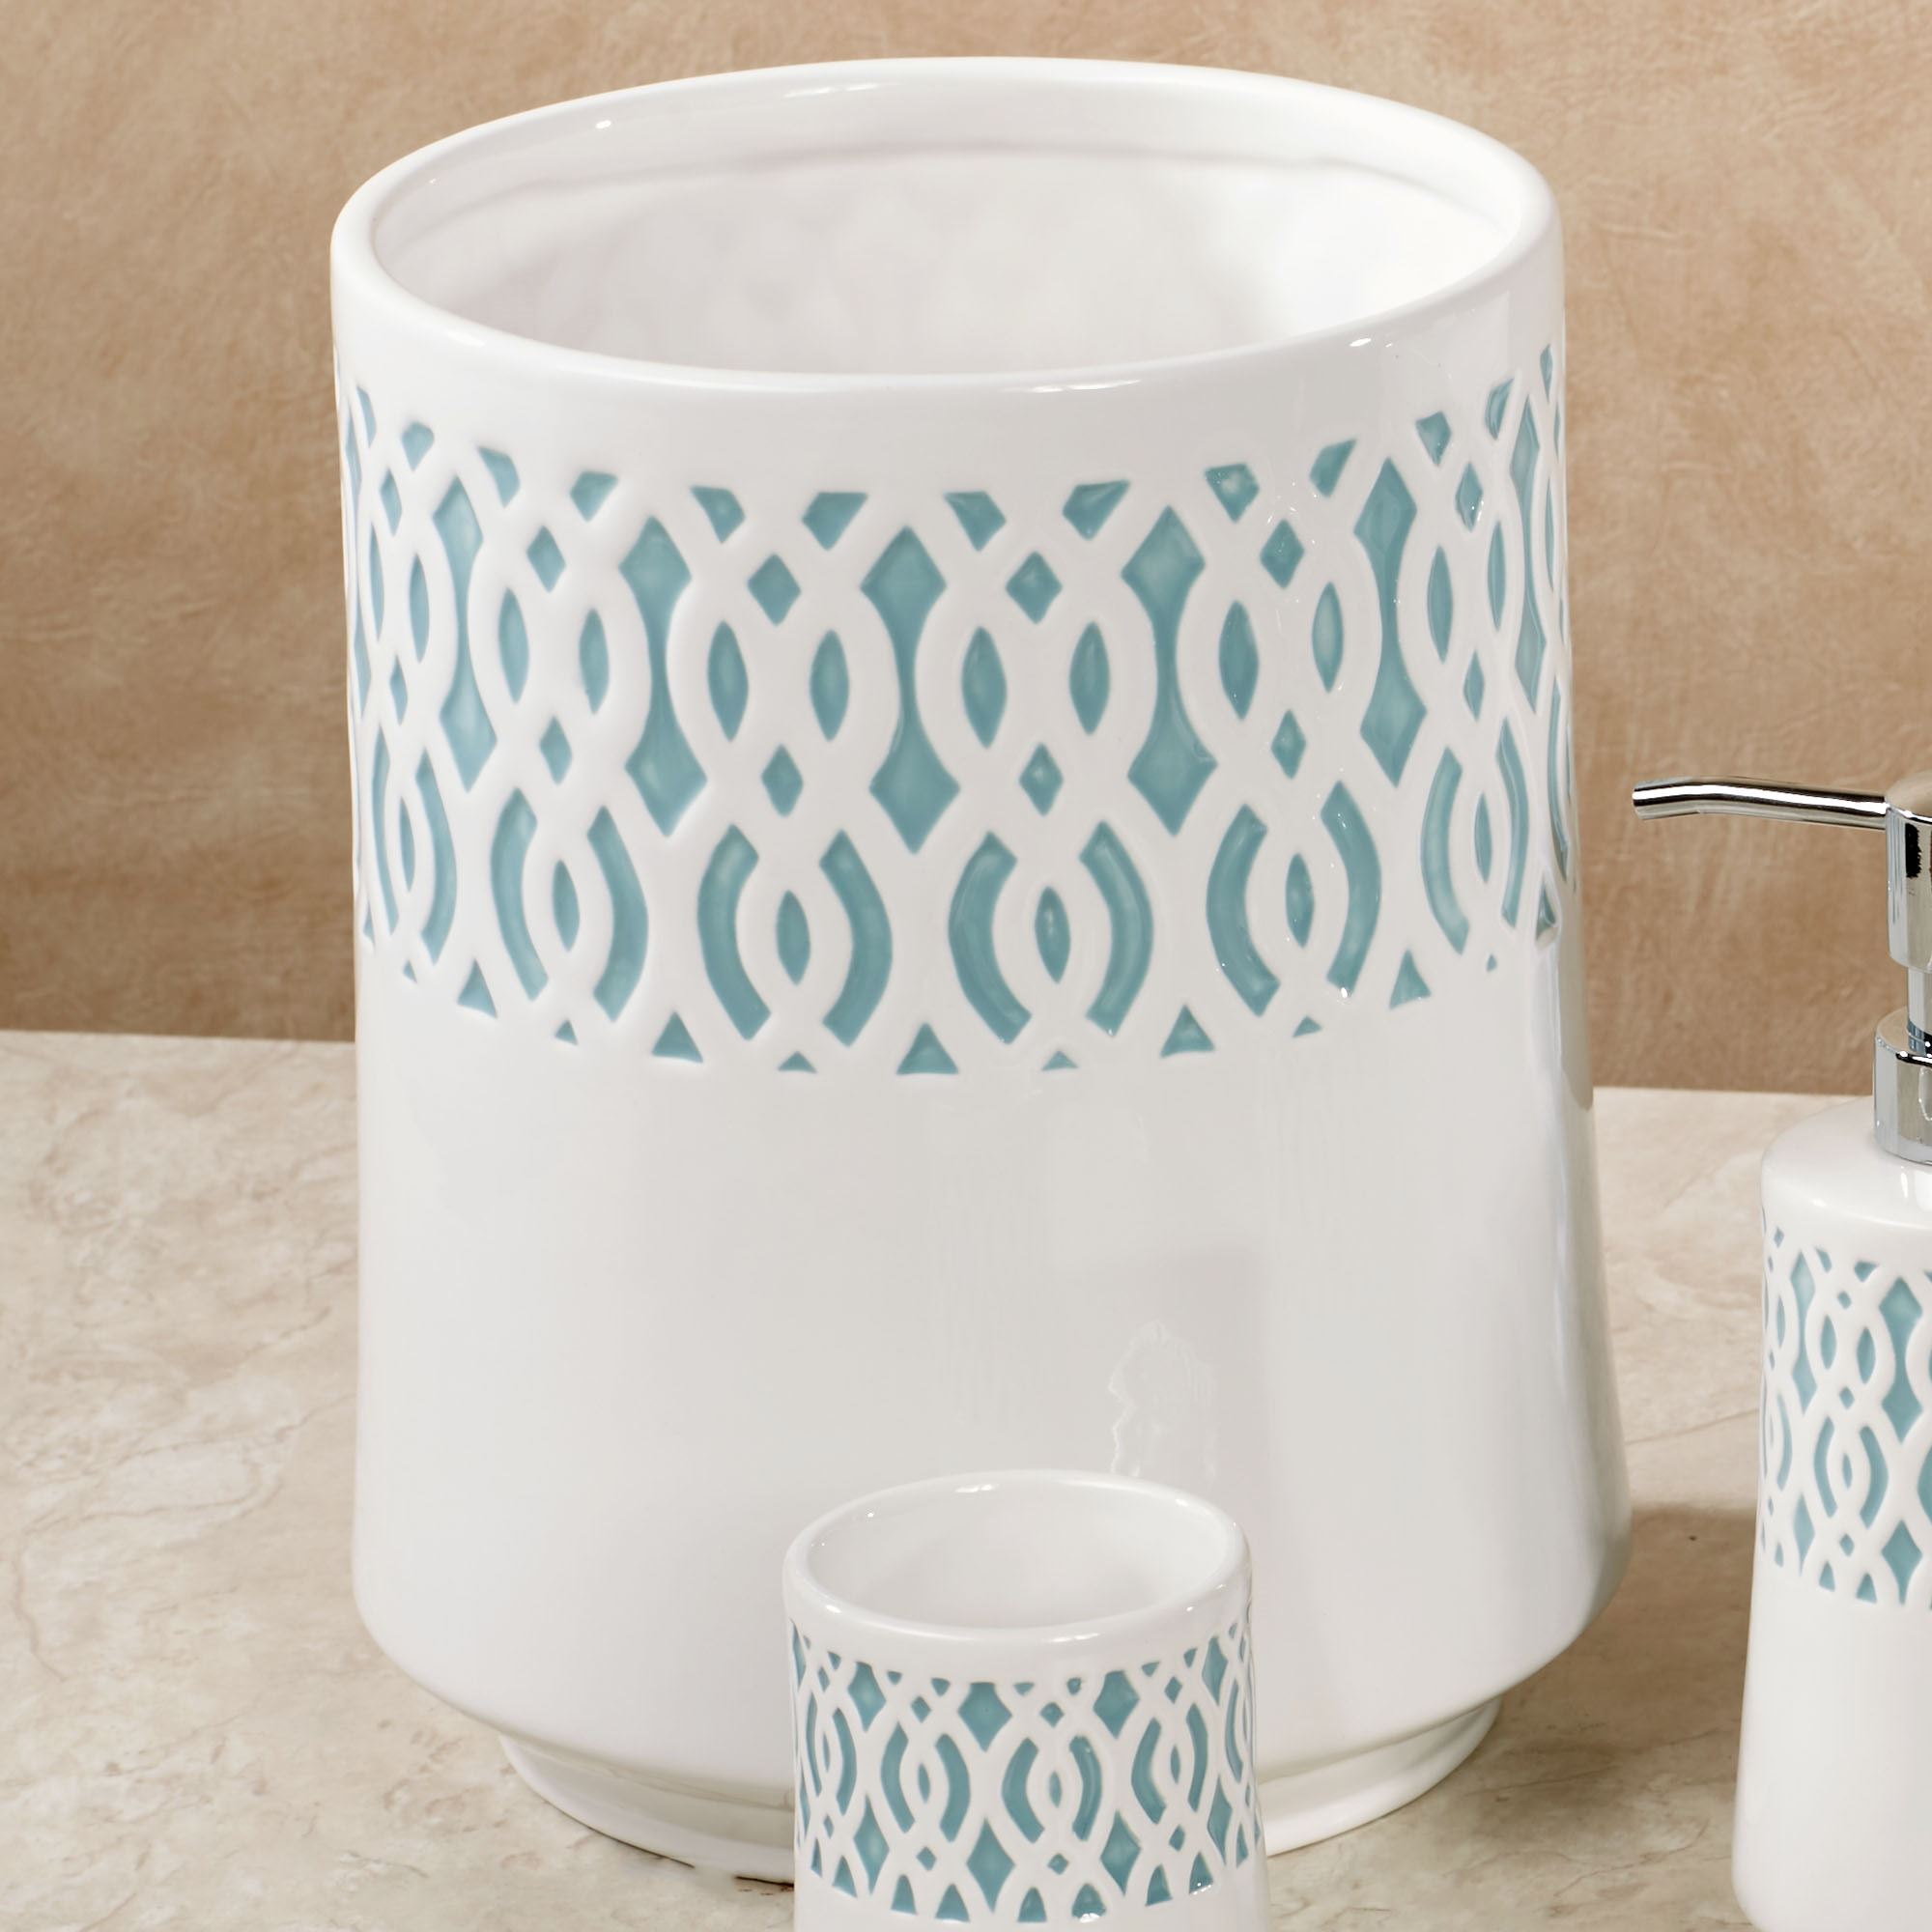 Watercolor Lattice Ivory Ceramic Bath Accessories